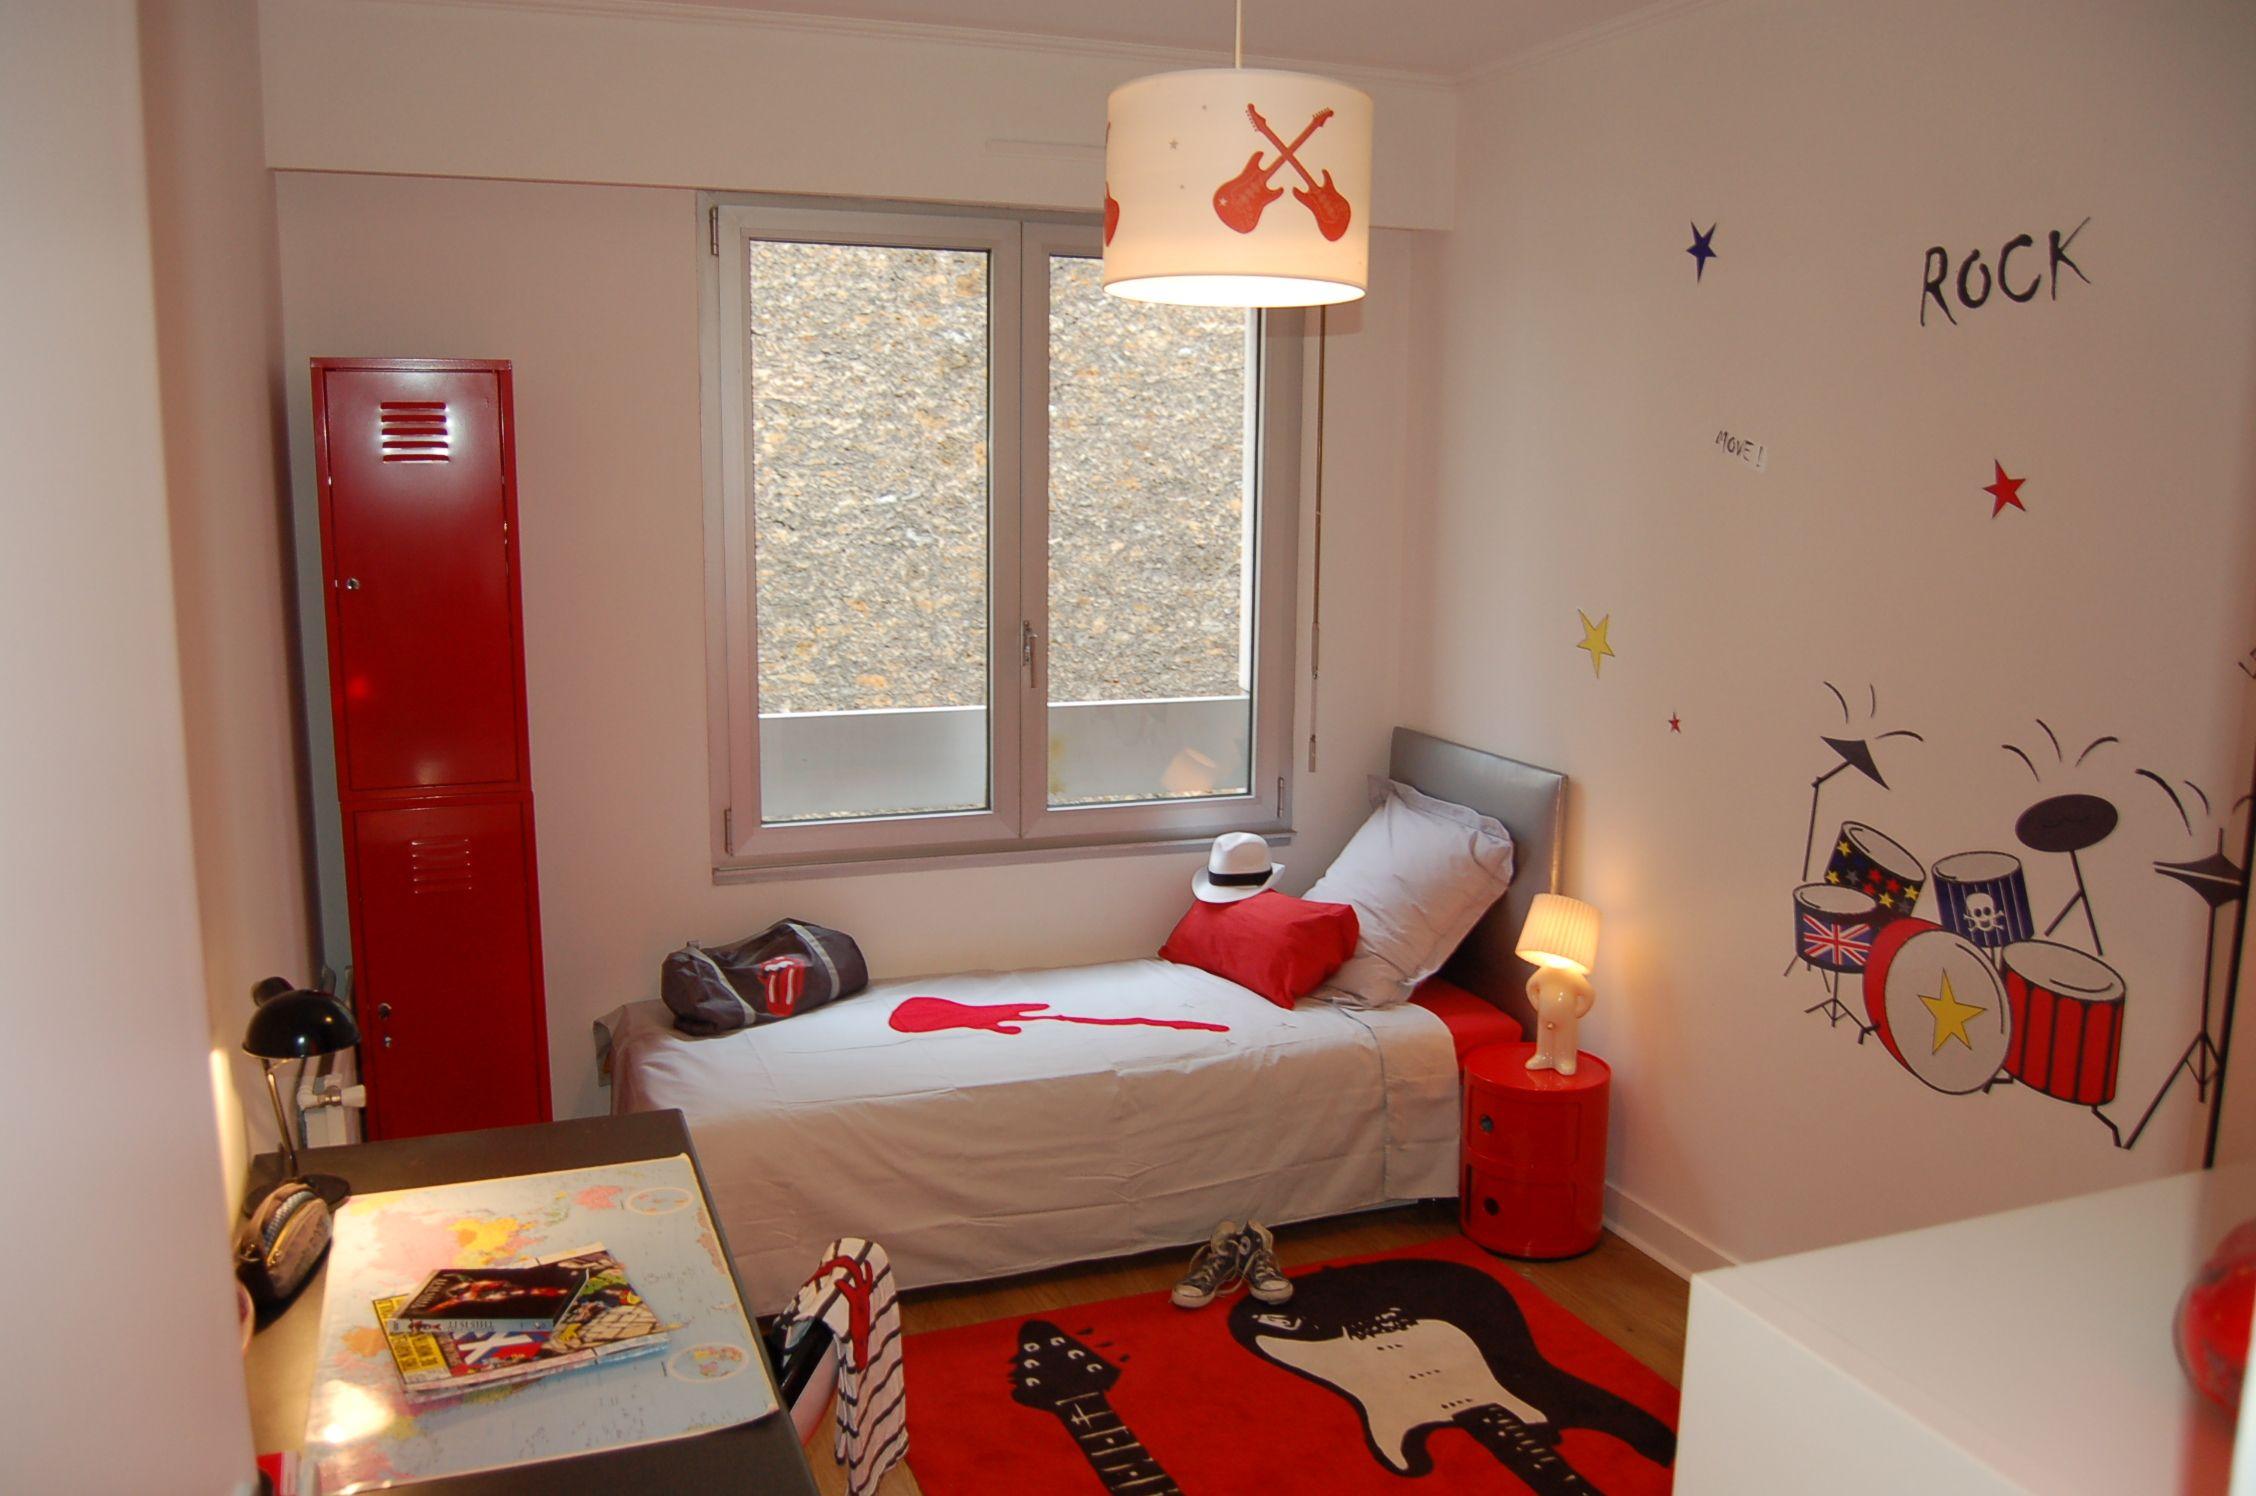 chambre rouge, chambre ado, chambre Nanelle, chambre rock, tapis